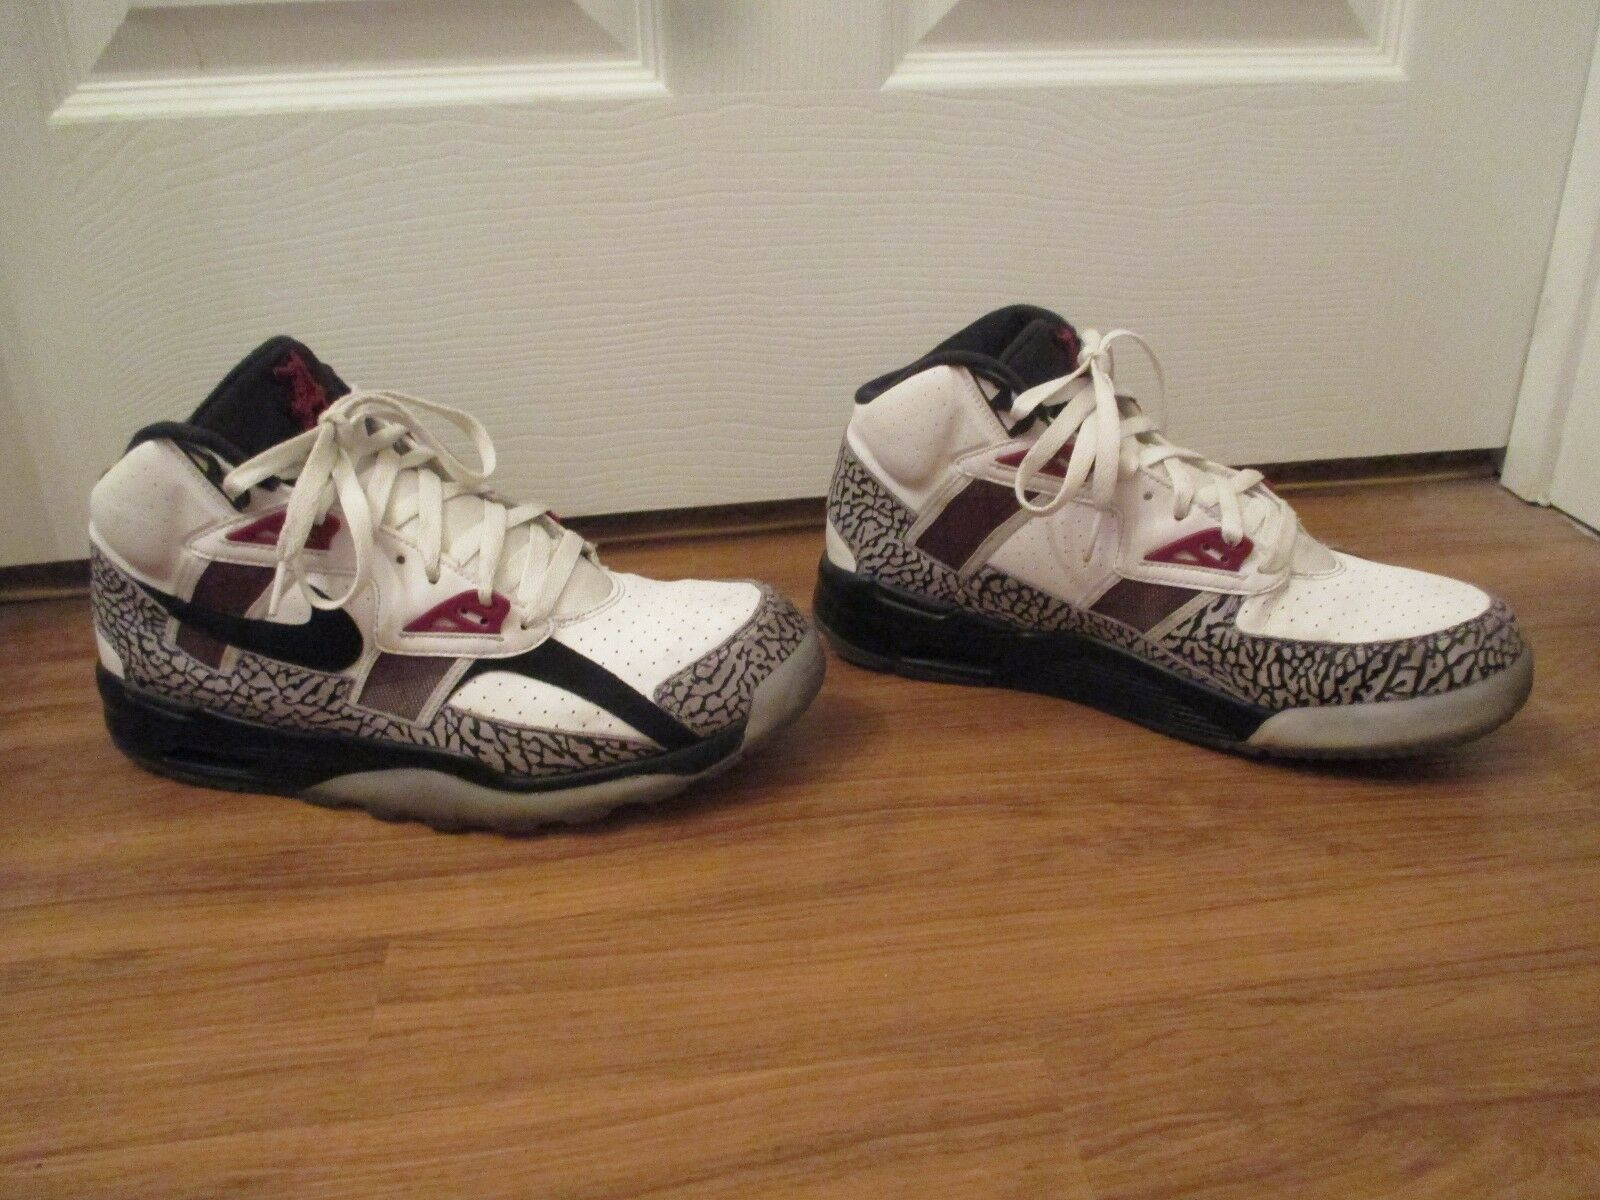 Used Worn Size 11 Nike Air Trainer SC High PRM QS Alabama Crimson Tide Shoes